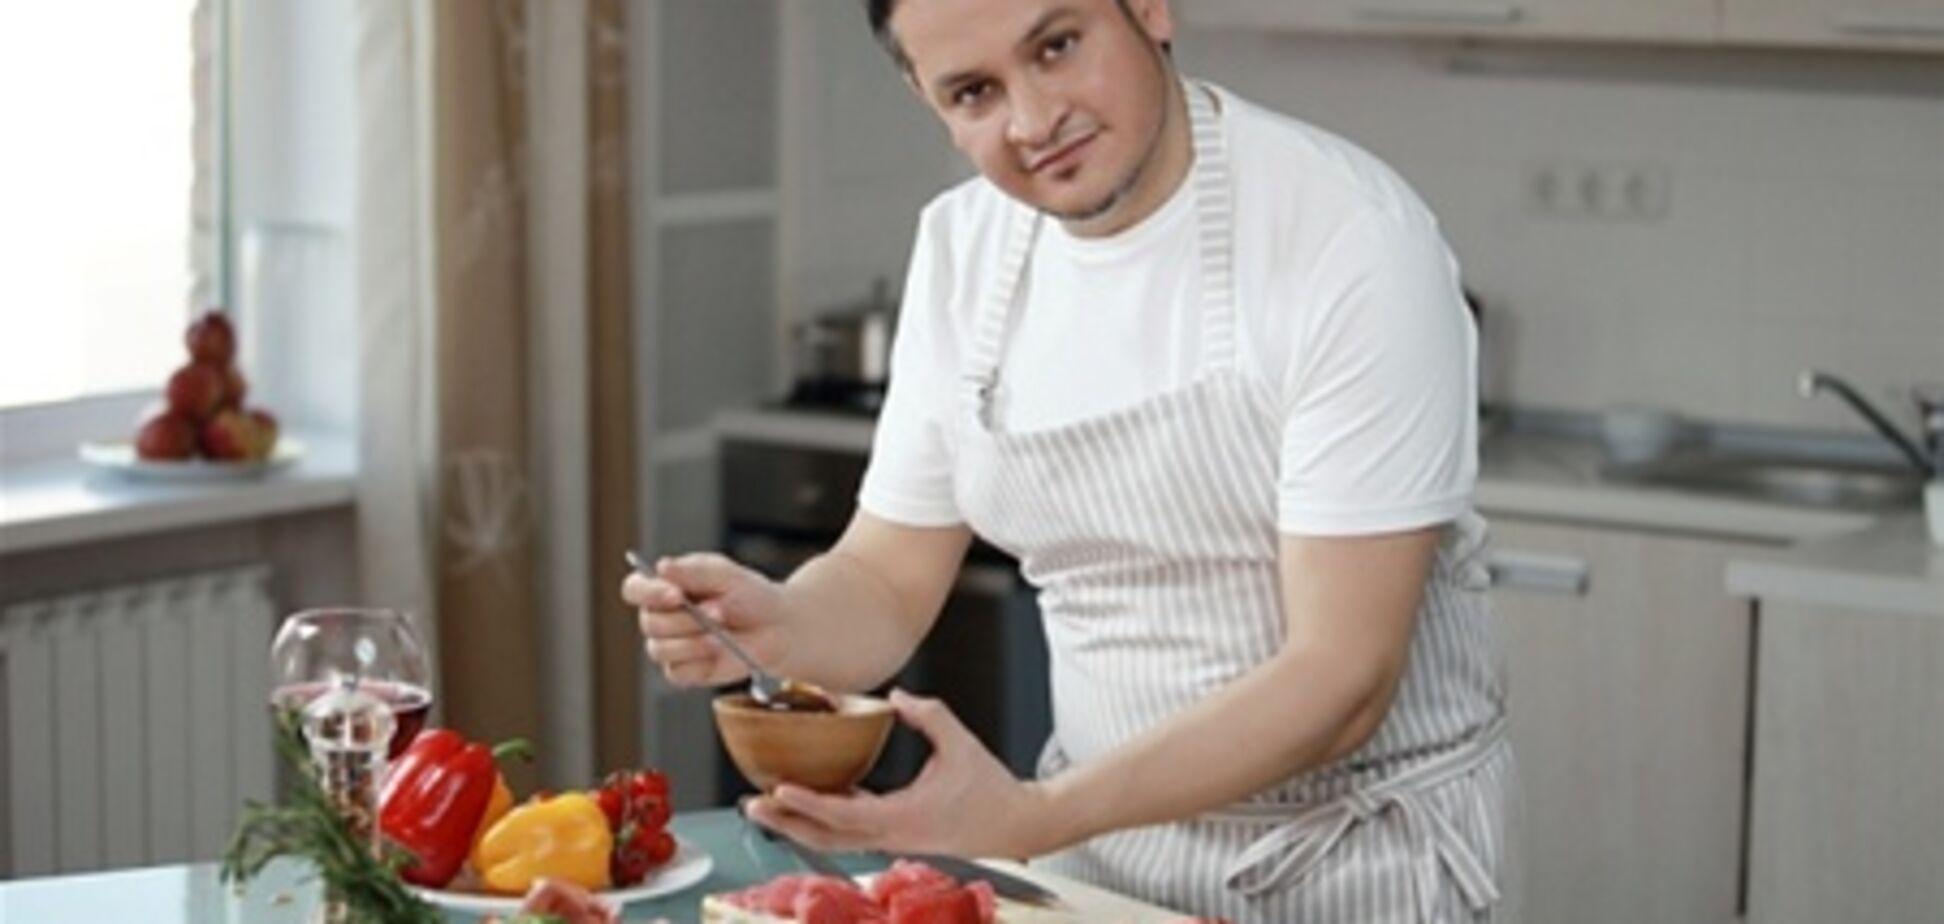 Шеф-повар Браво показал себя в детстве. Фото